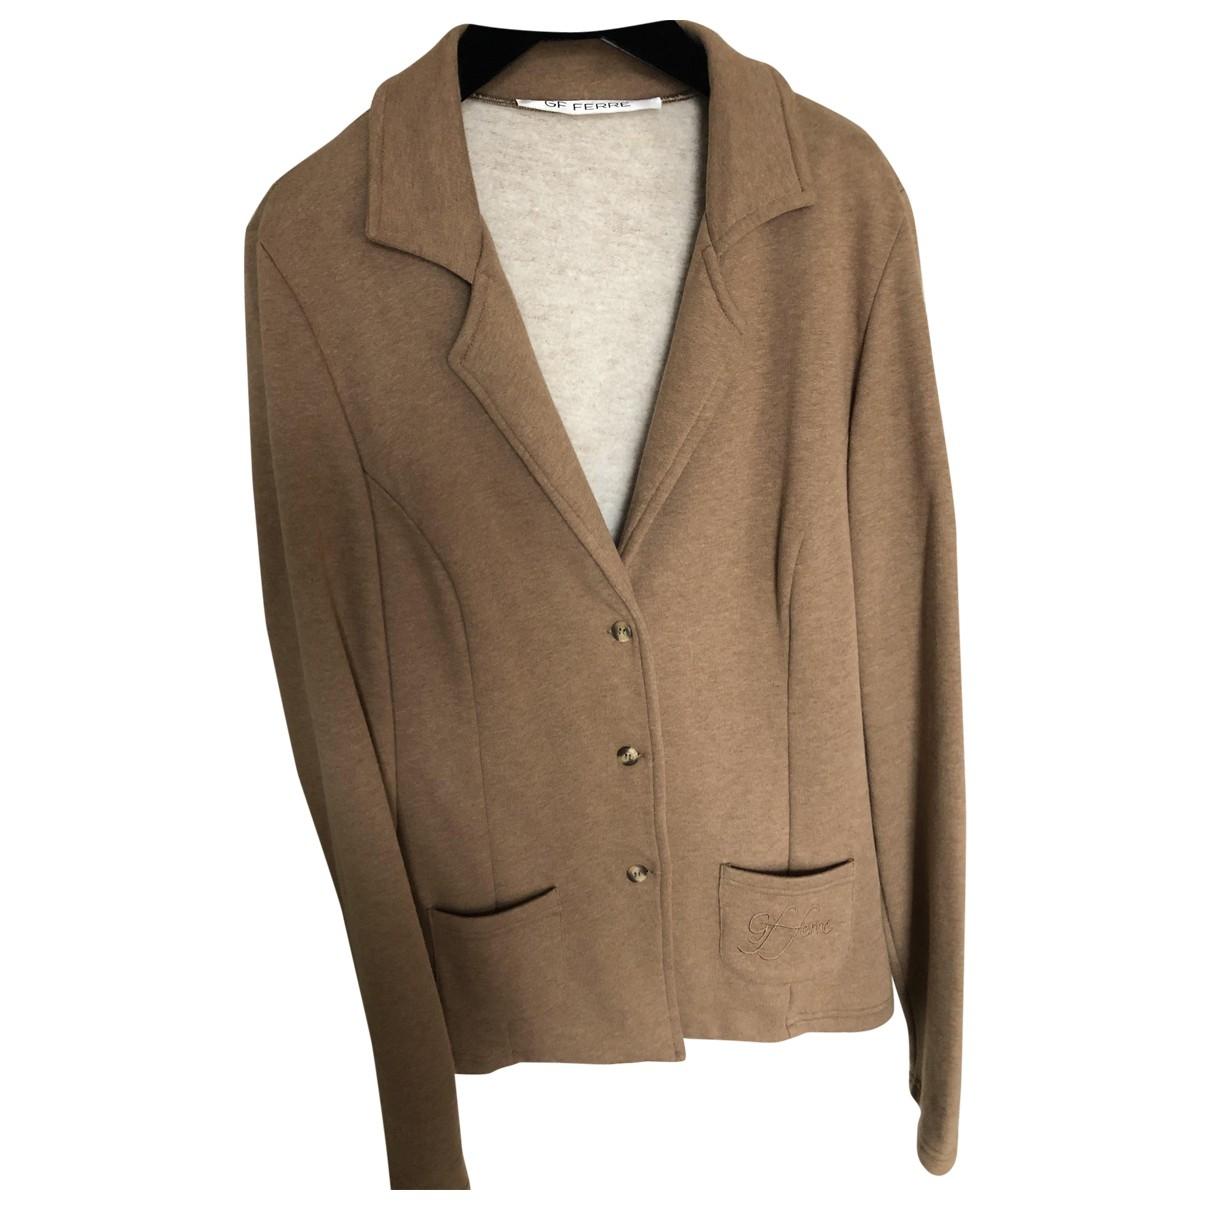 Gianfranco Ferré \N Camel Cotton jacket for Women L International